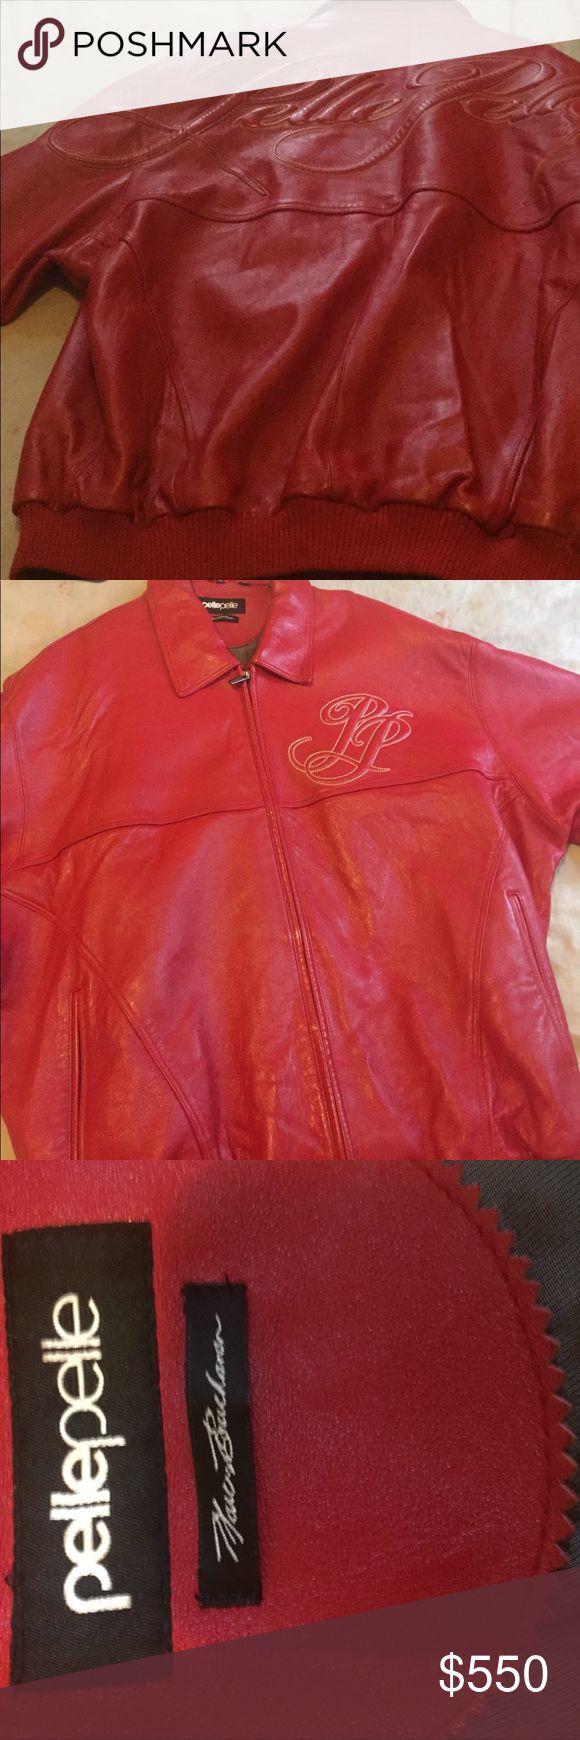 Pelle Pelle $550 Basically BRAND NEW!!! Heavy Duty Leather!Worn maybe twice... NO LOW BALLERS!!! Pelle Pelle Jackets & Coats